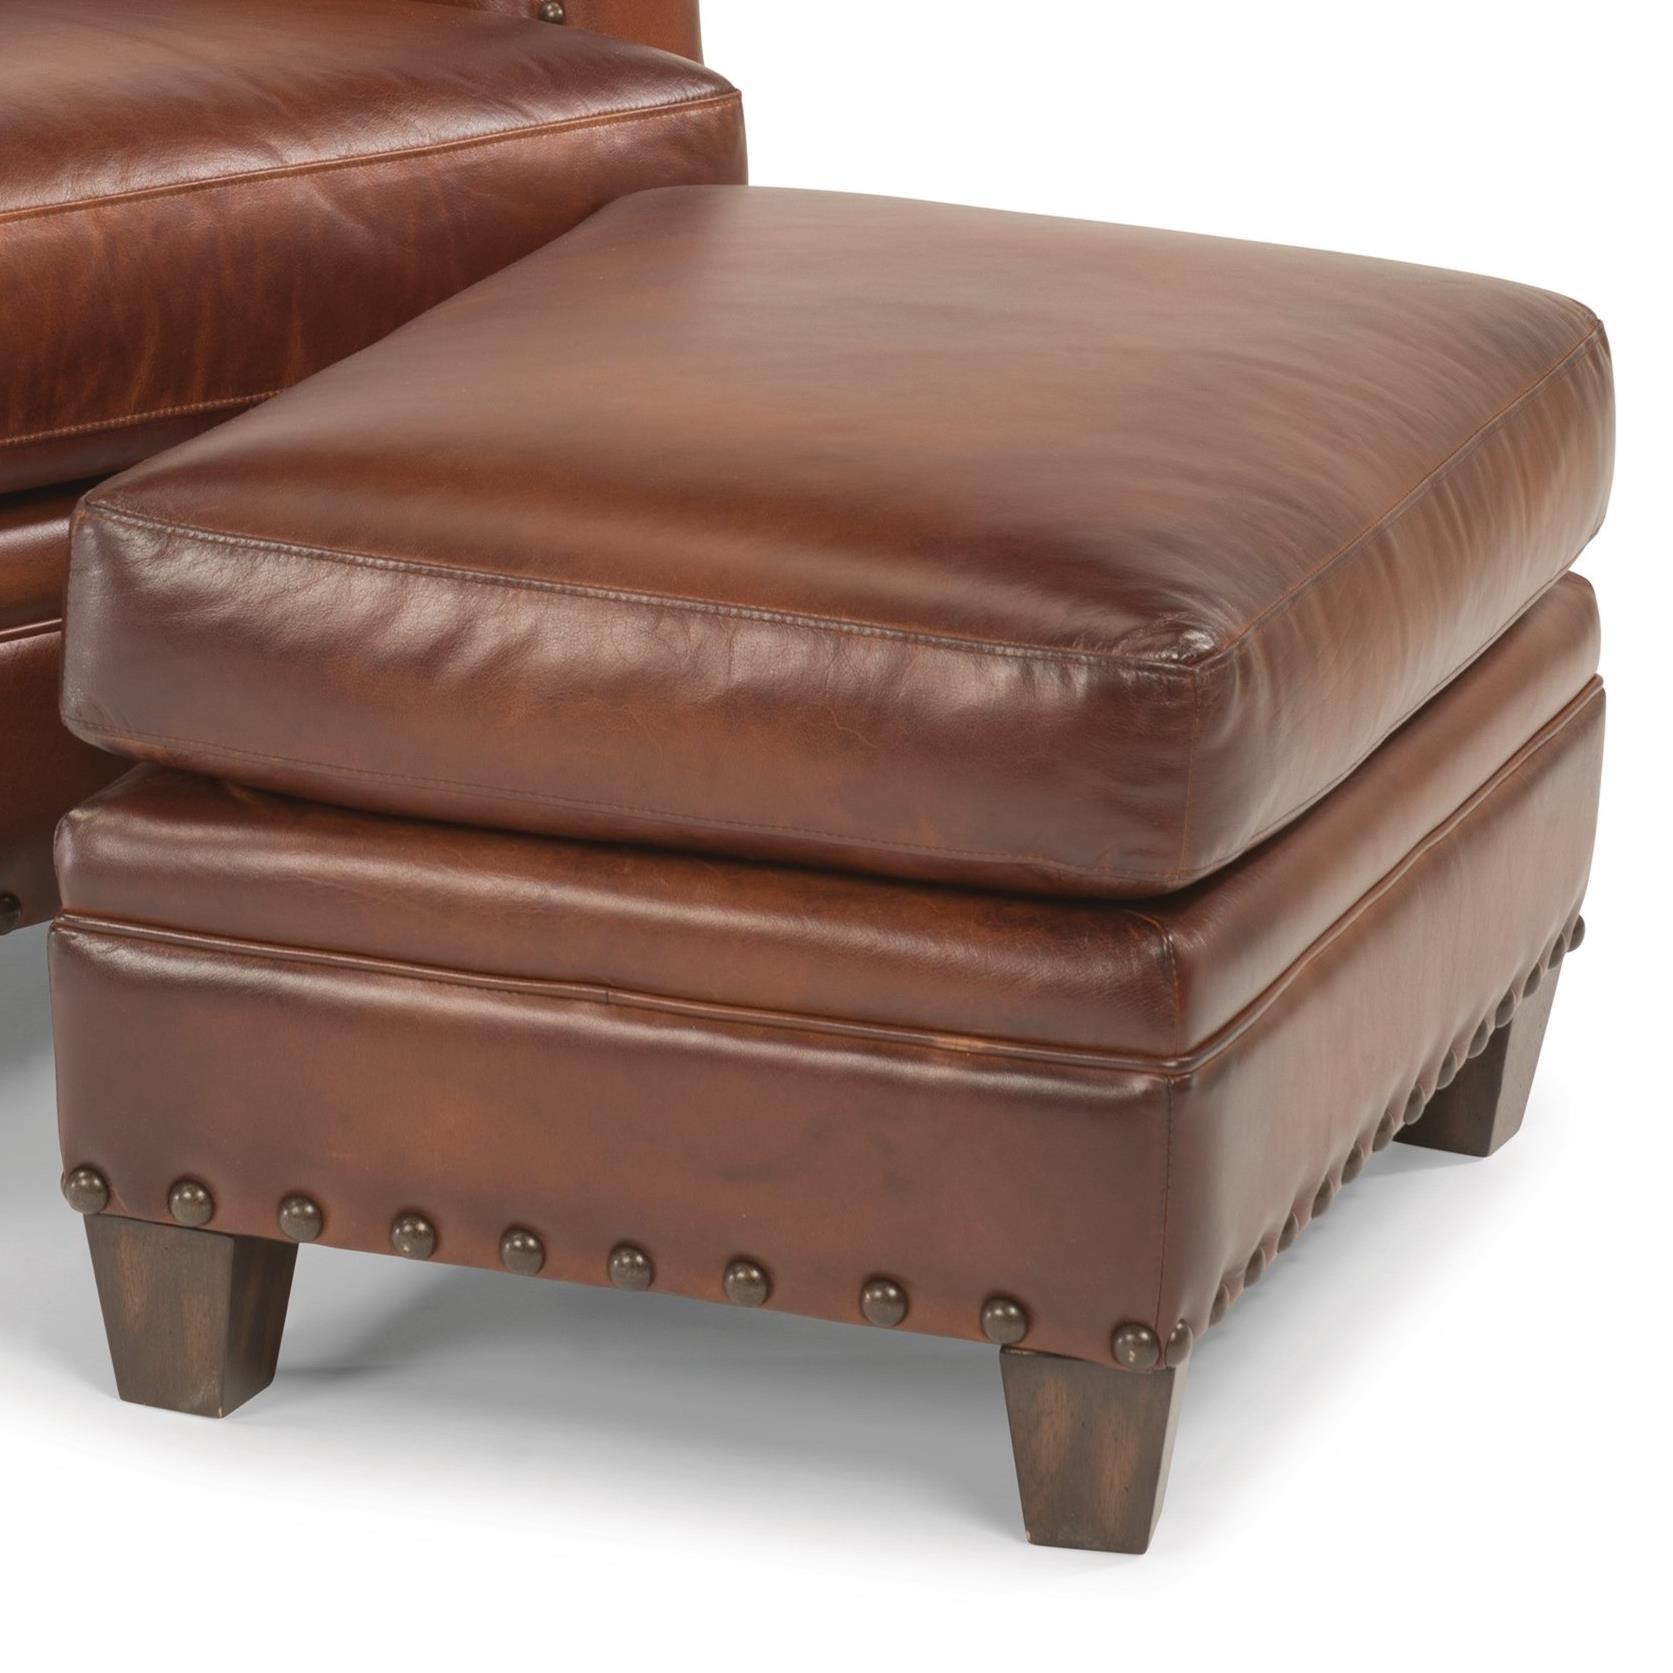 Flexsteel Latitudes Maxfield 1505 08 Rustic Leather